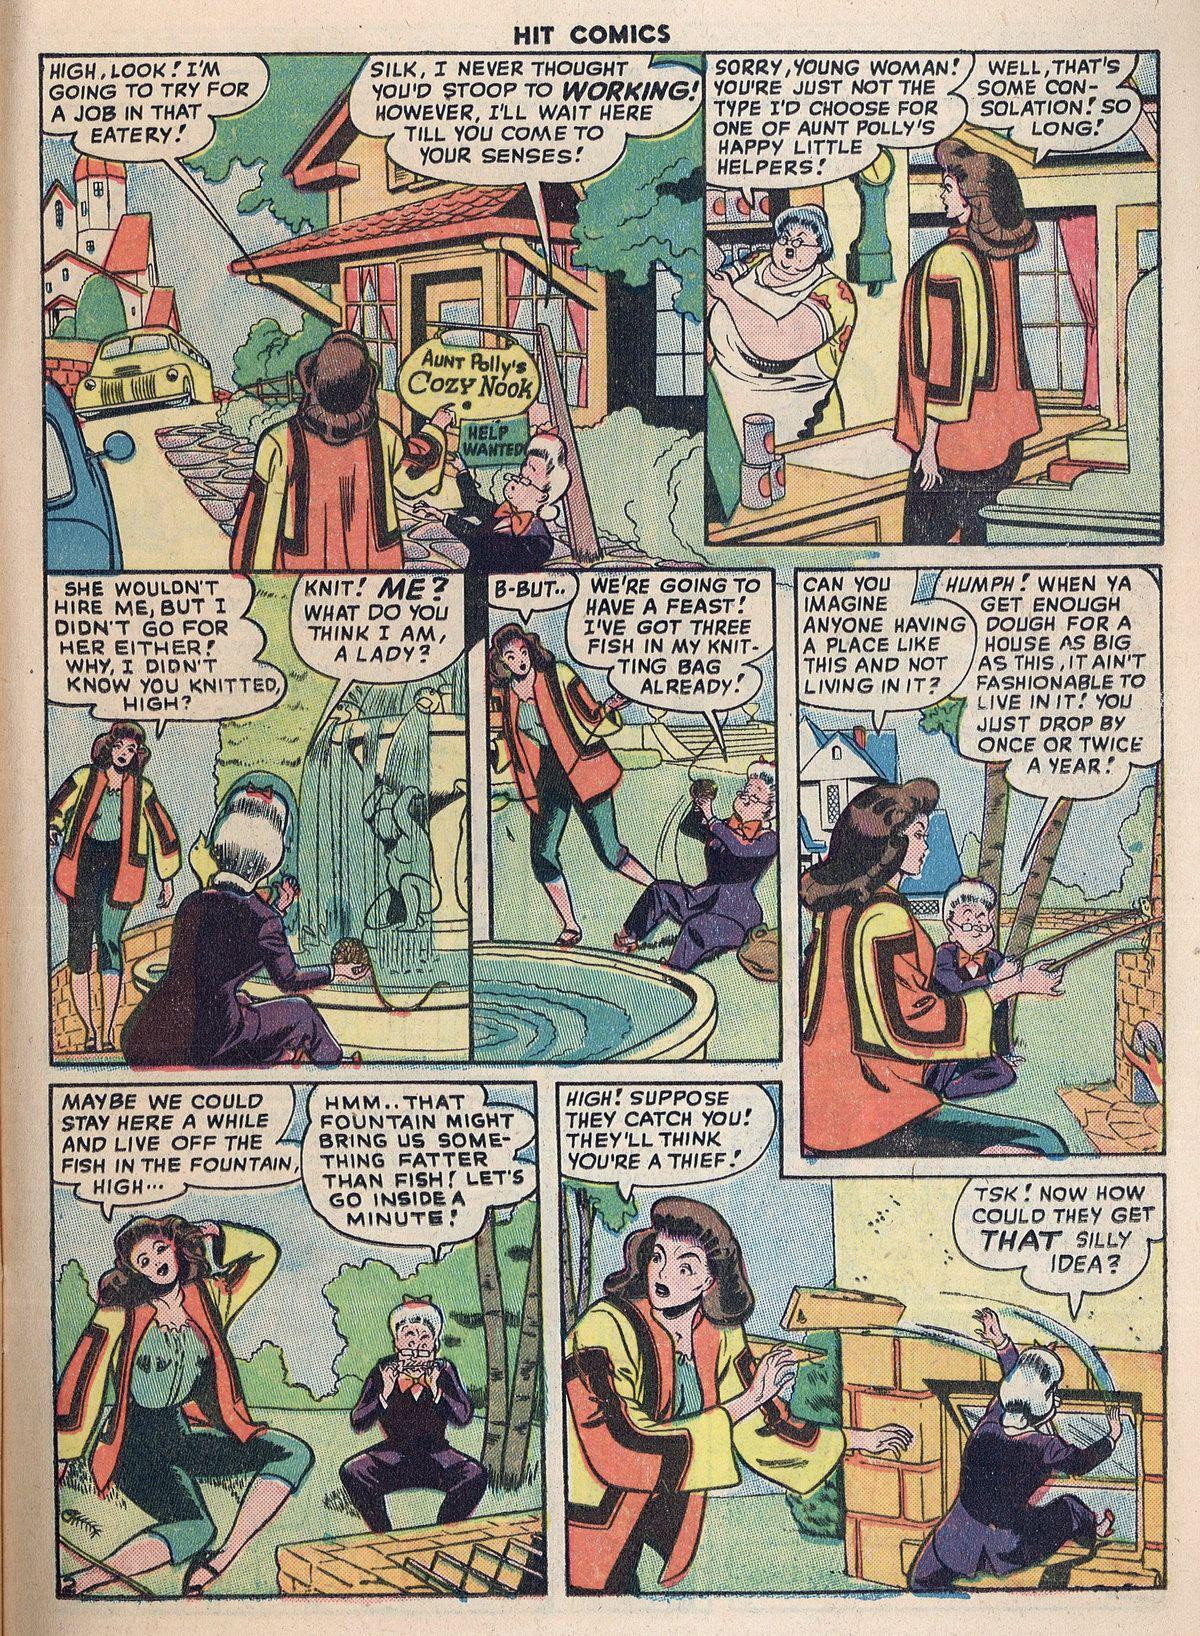 Read online Hit Comics comic -  Issue #55 - 17